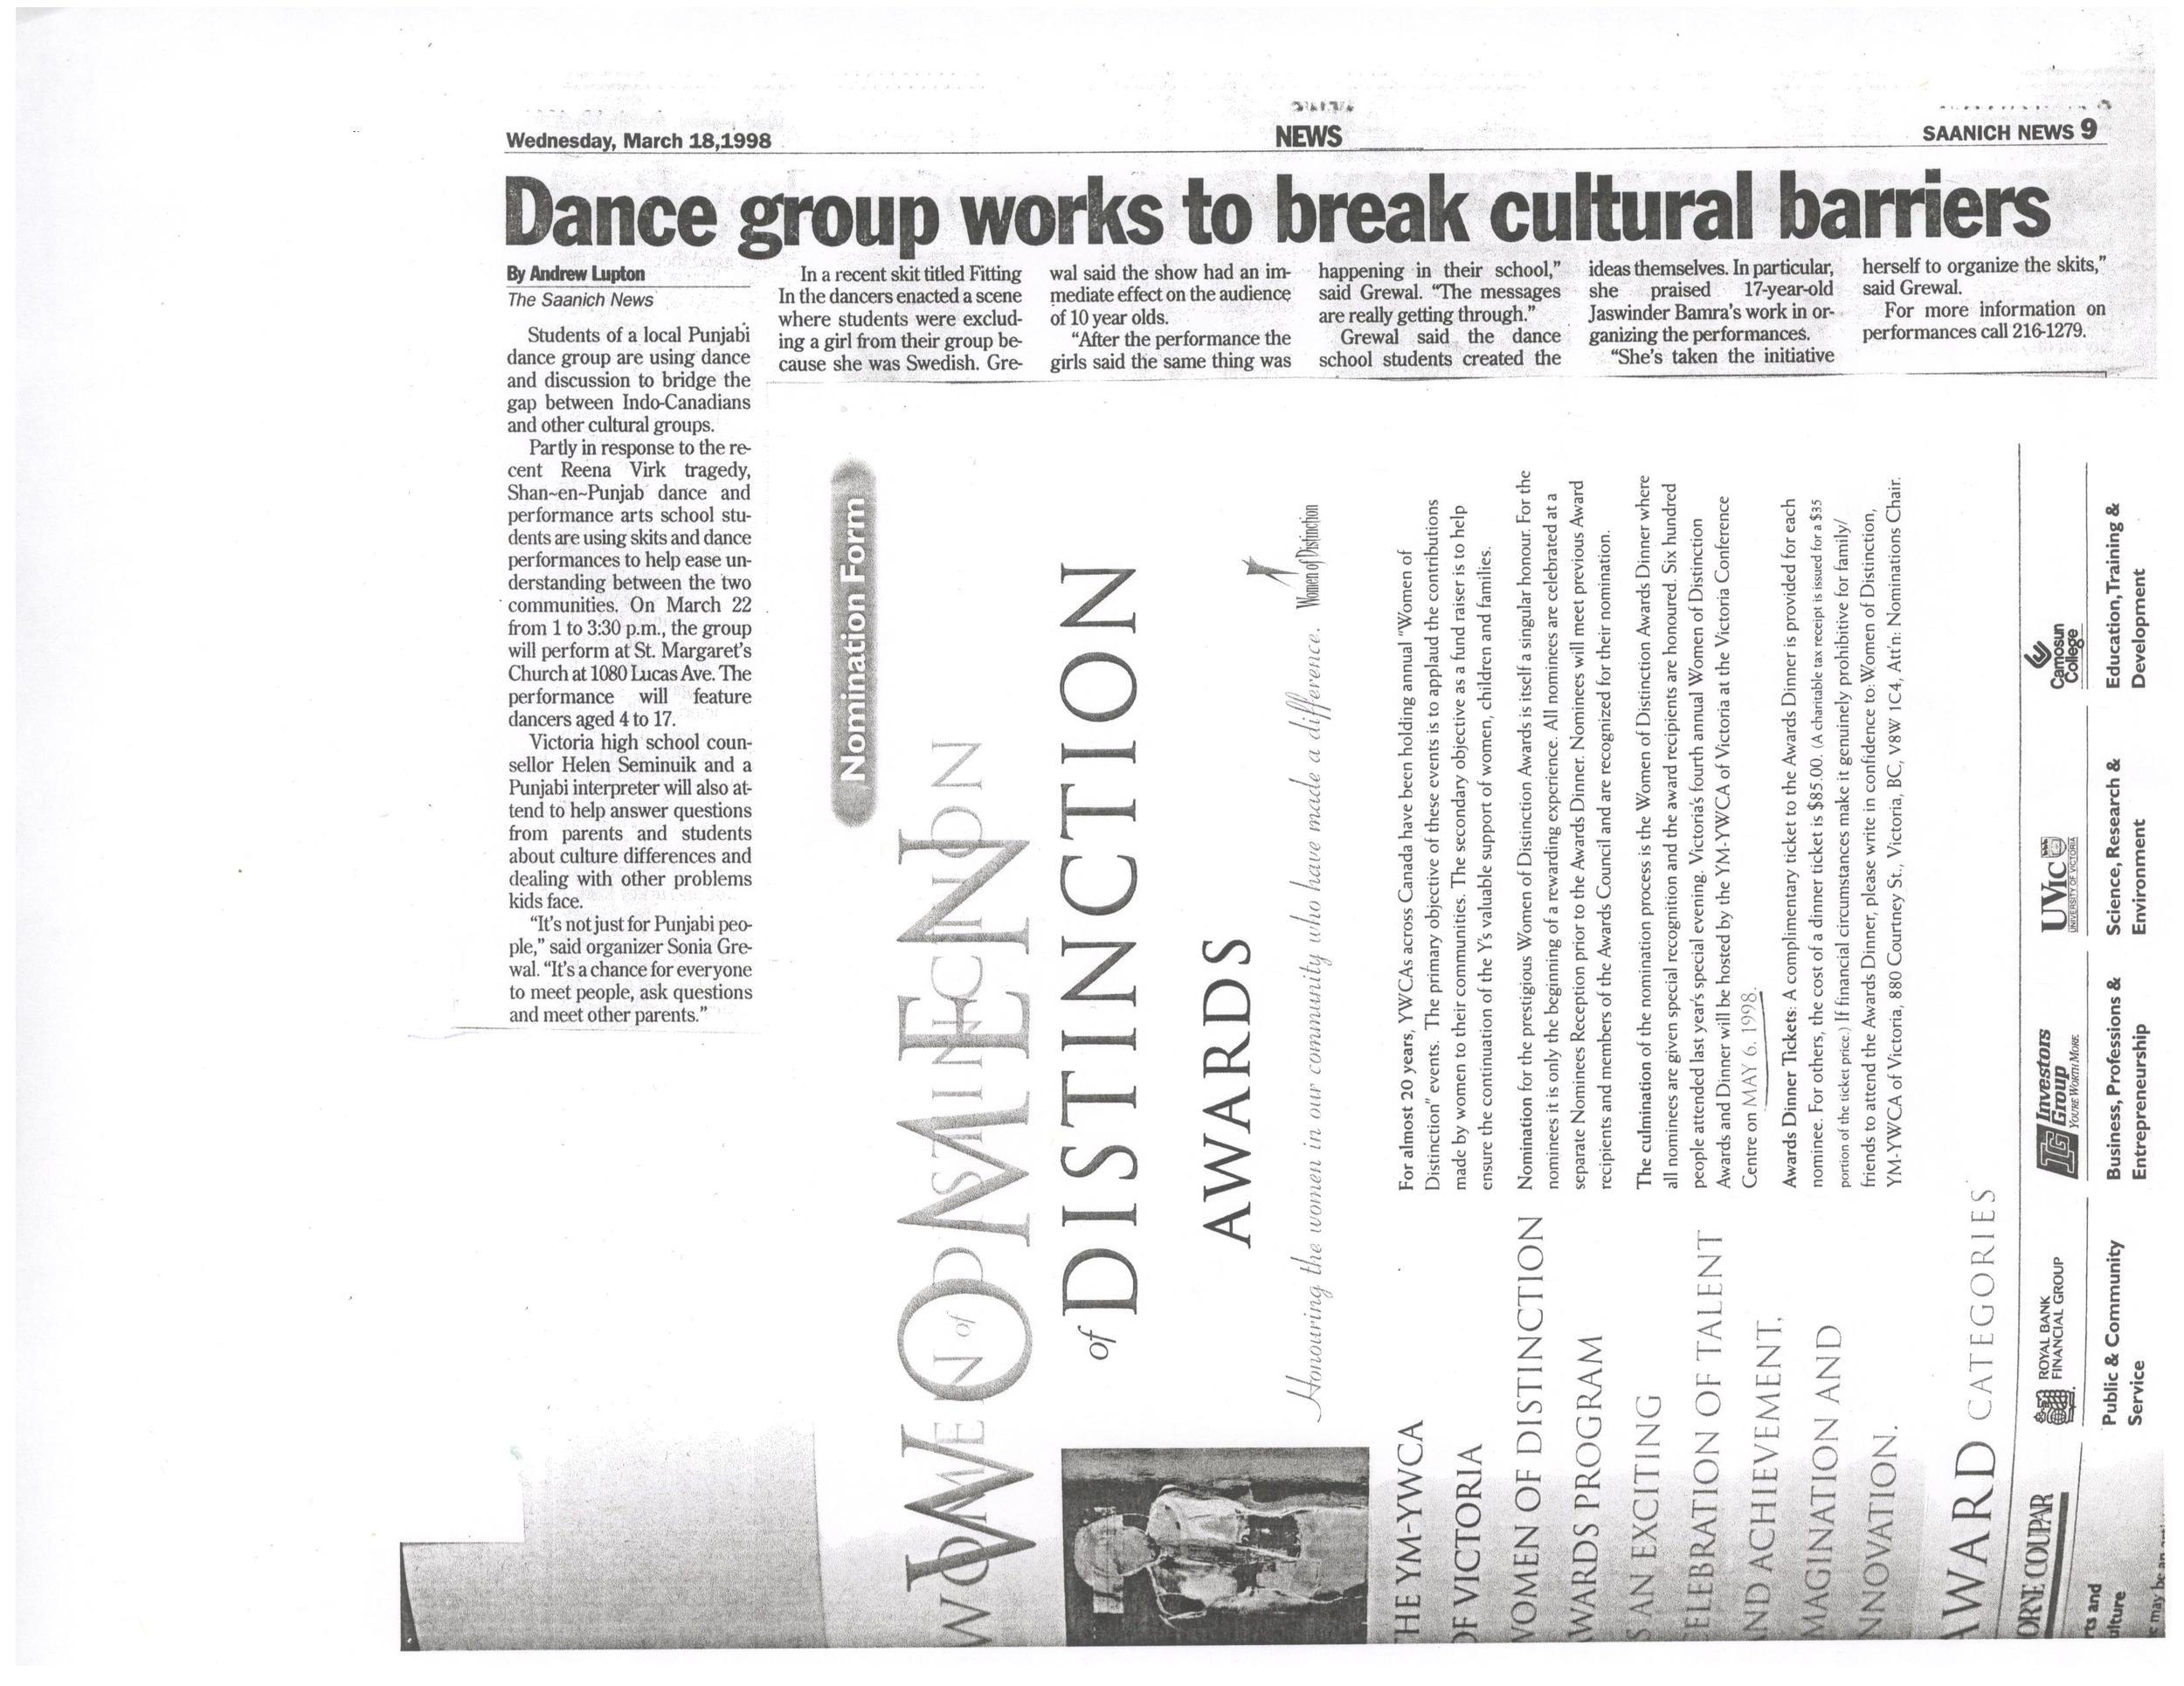 1998_dance_group_works_to_break_cultural_barriers.jpg